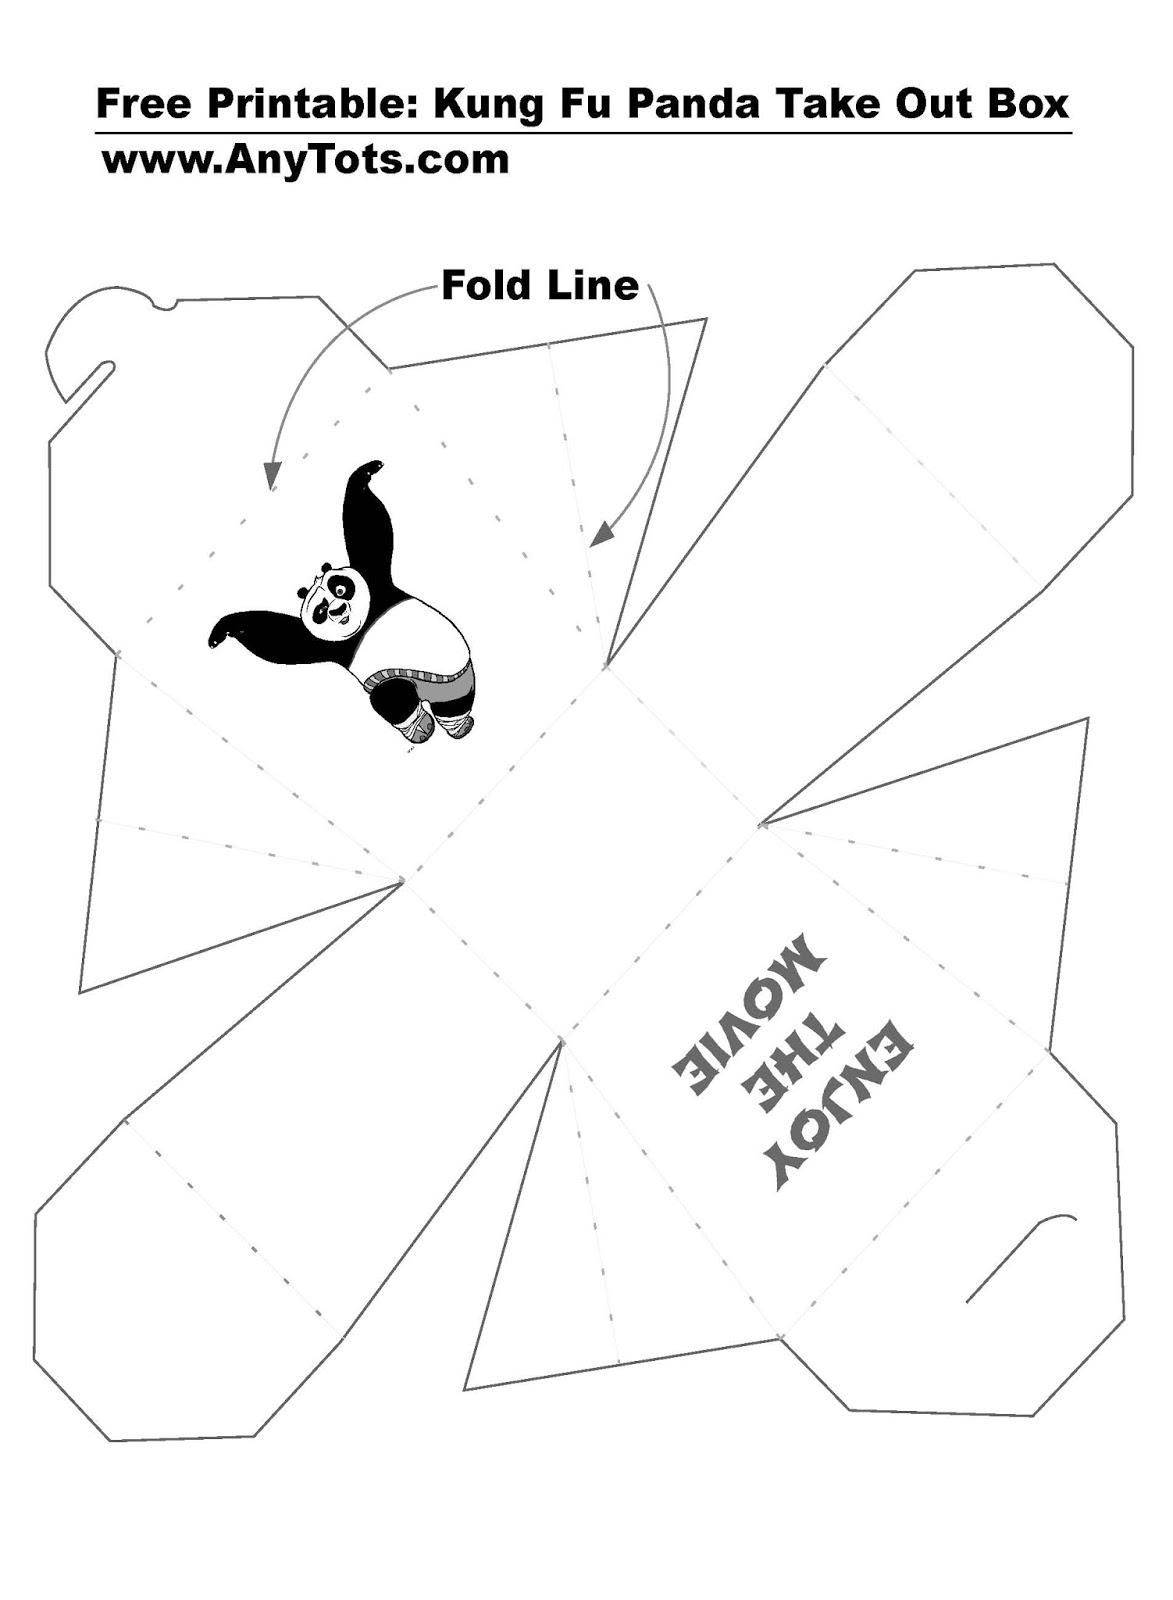 Kung Fu Panda Party Ideas Free Printable Chinese Take Out Box Movie Set Giveaway